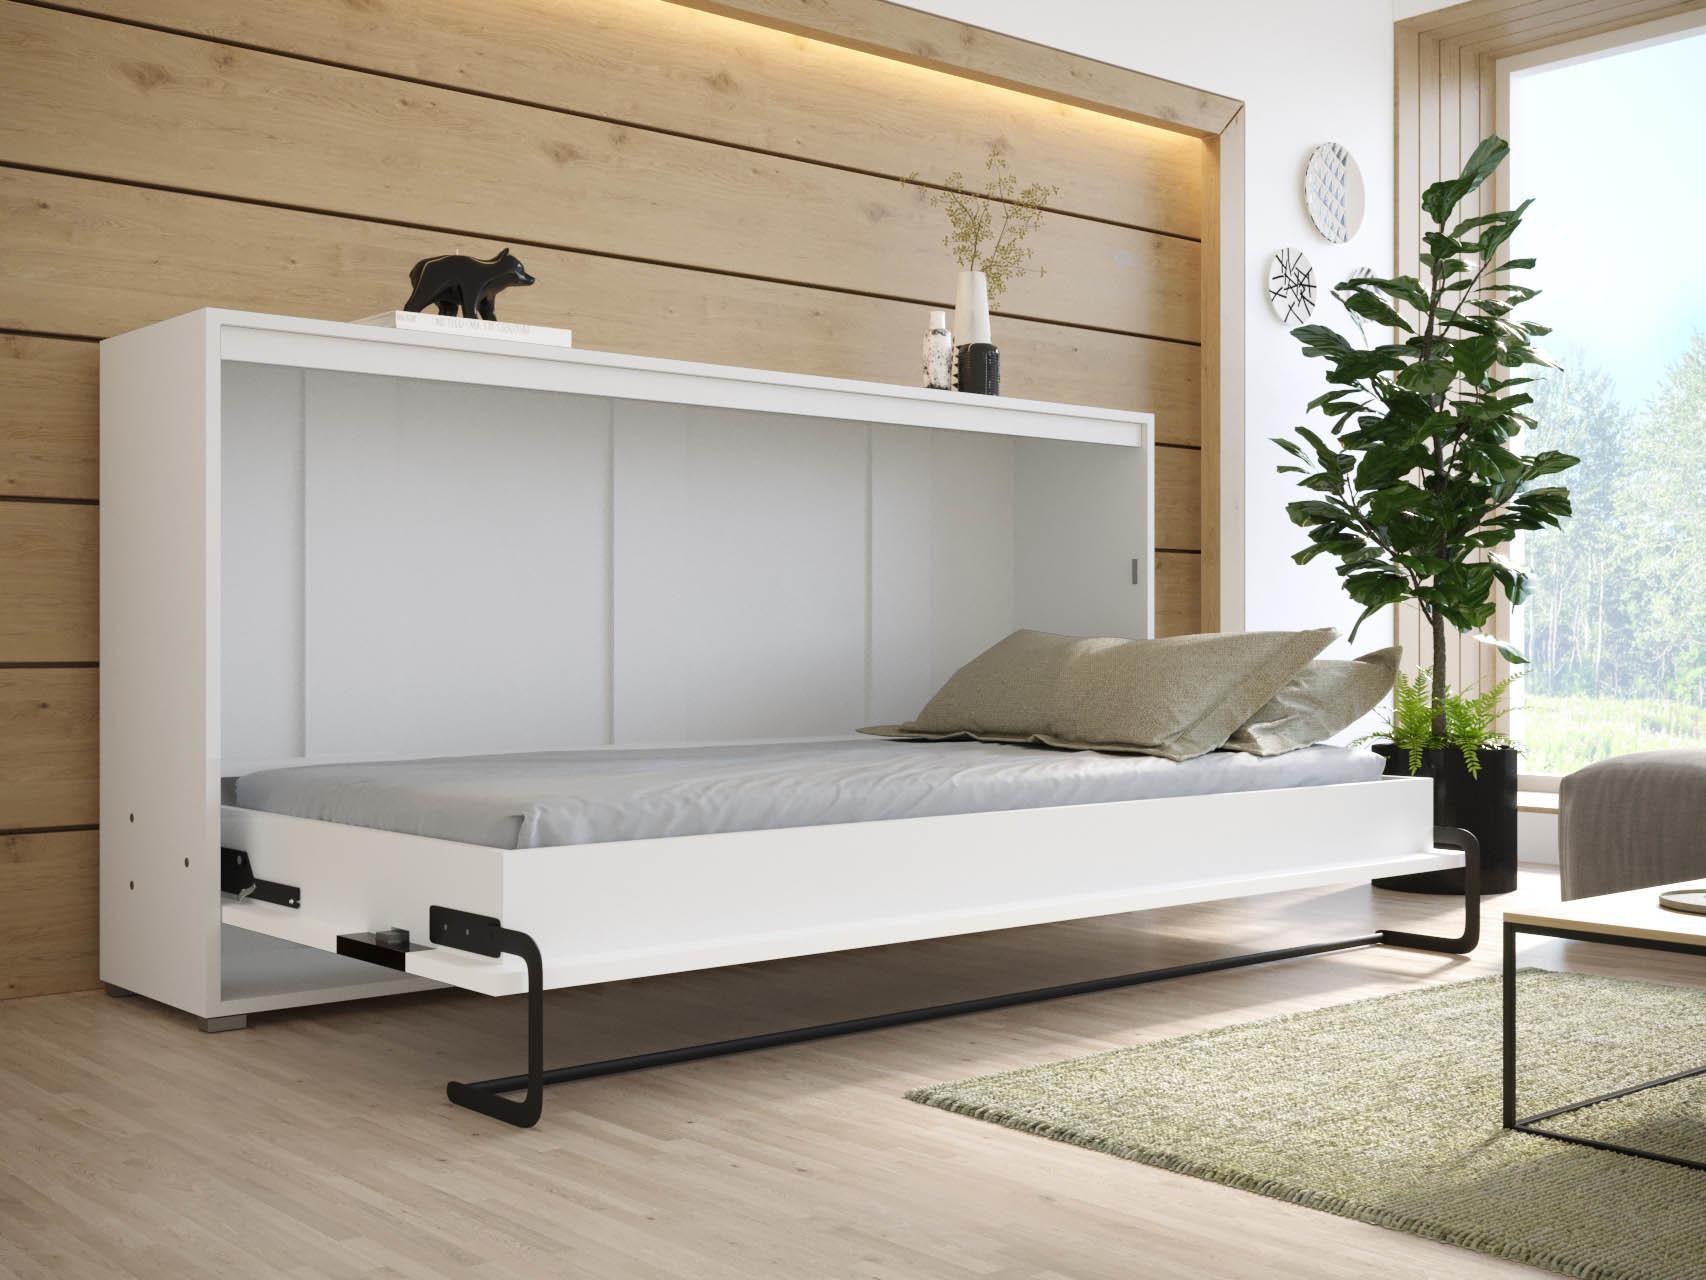 SB Jednolôžková sklápacia posteľ Magnus biela Rozmer lôžka: 200x90